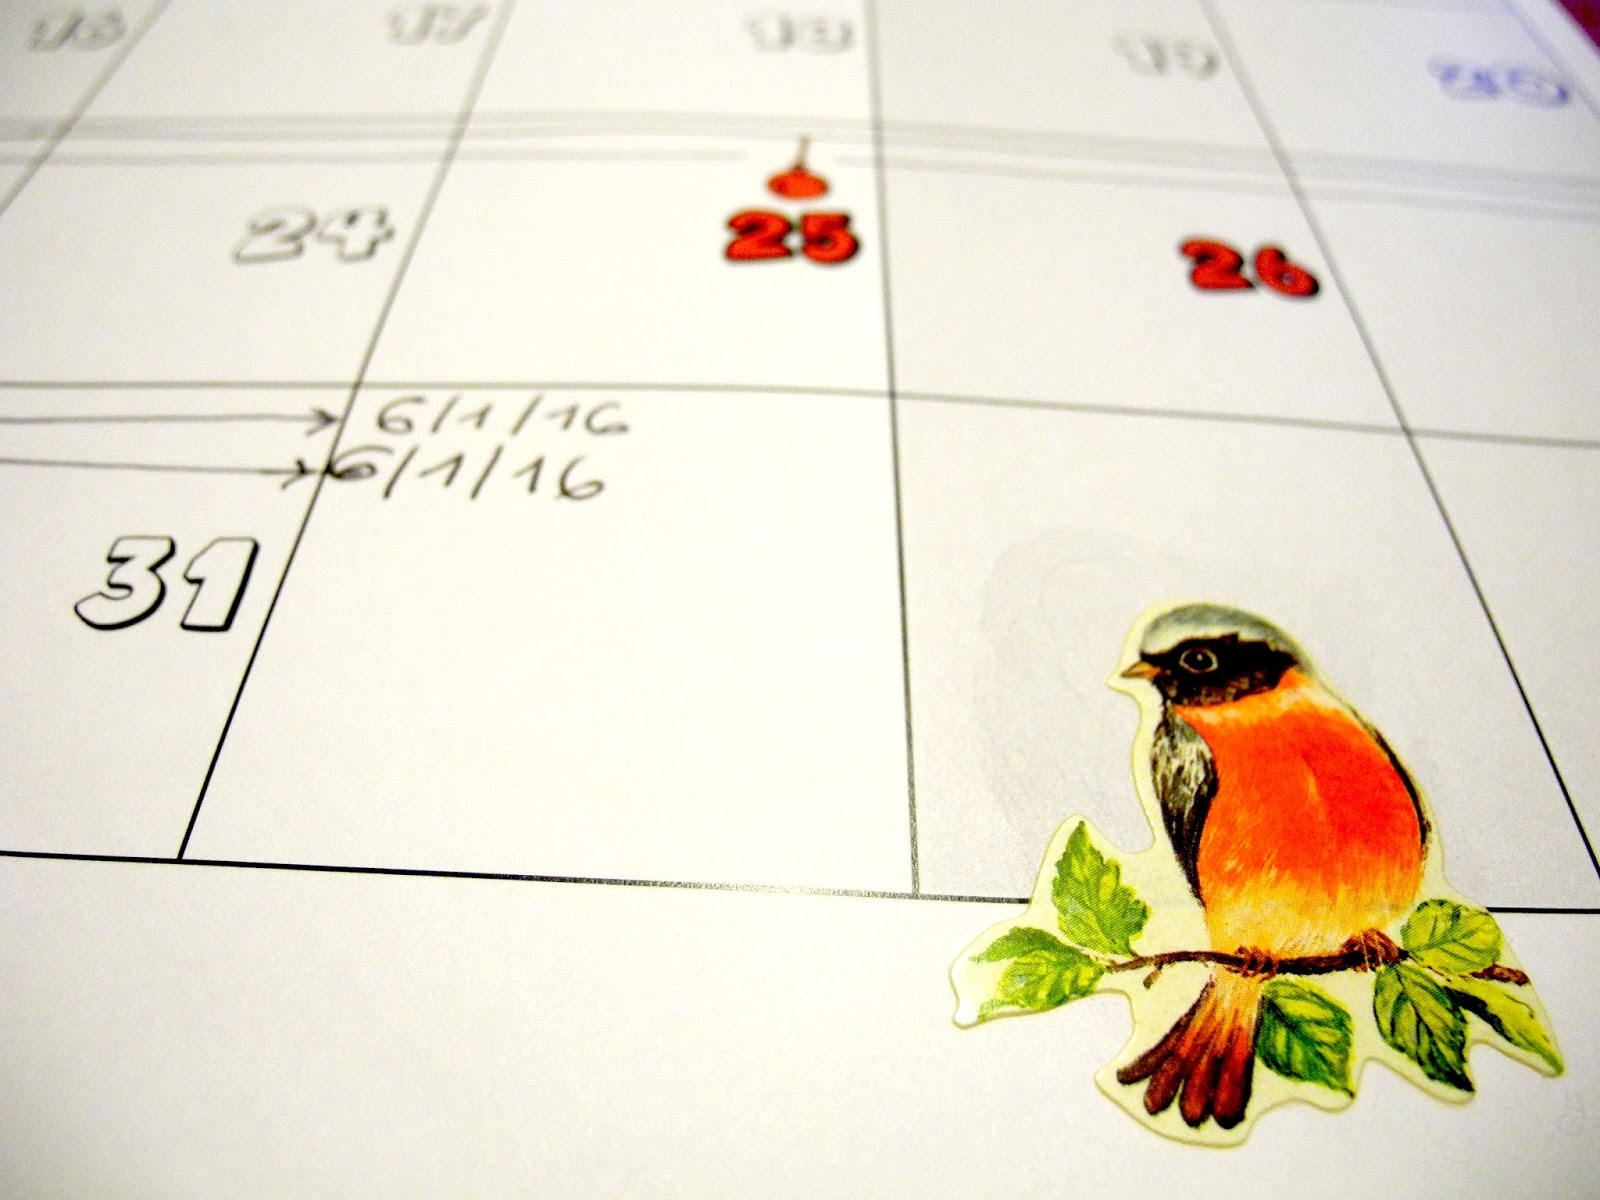 Calendario Anno 2015 Mensile.Voglio Una Mela Blu New Calendario Mensile 2016 Da